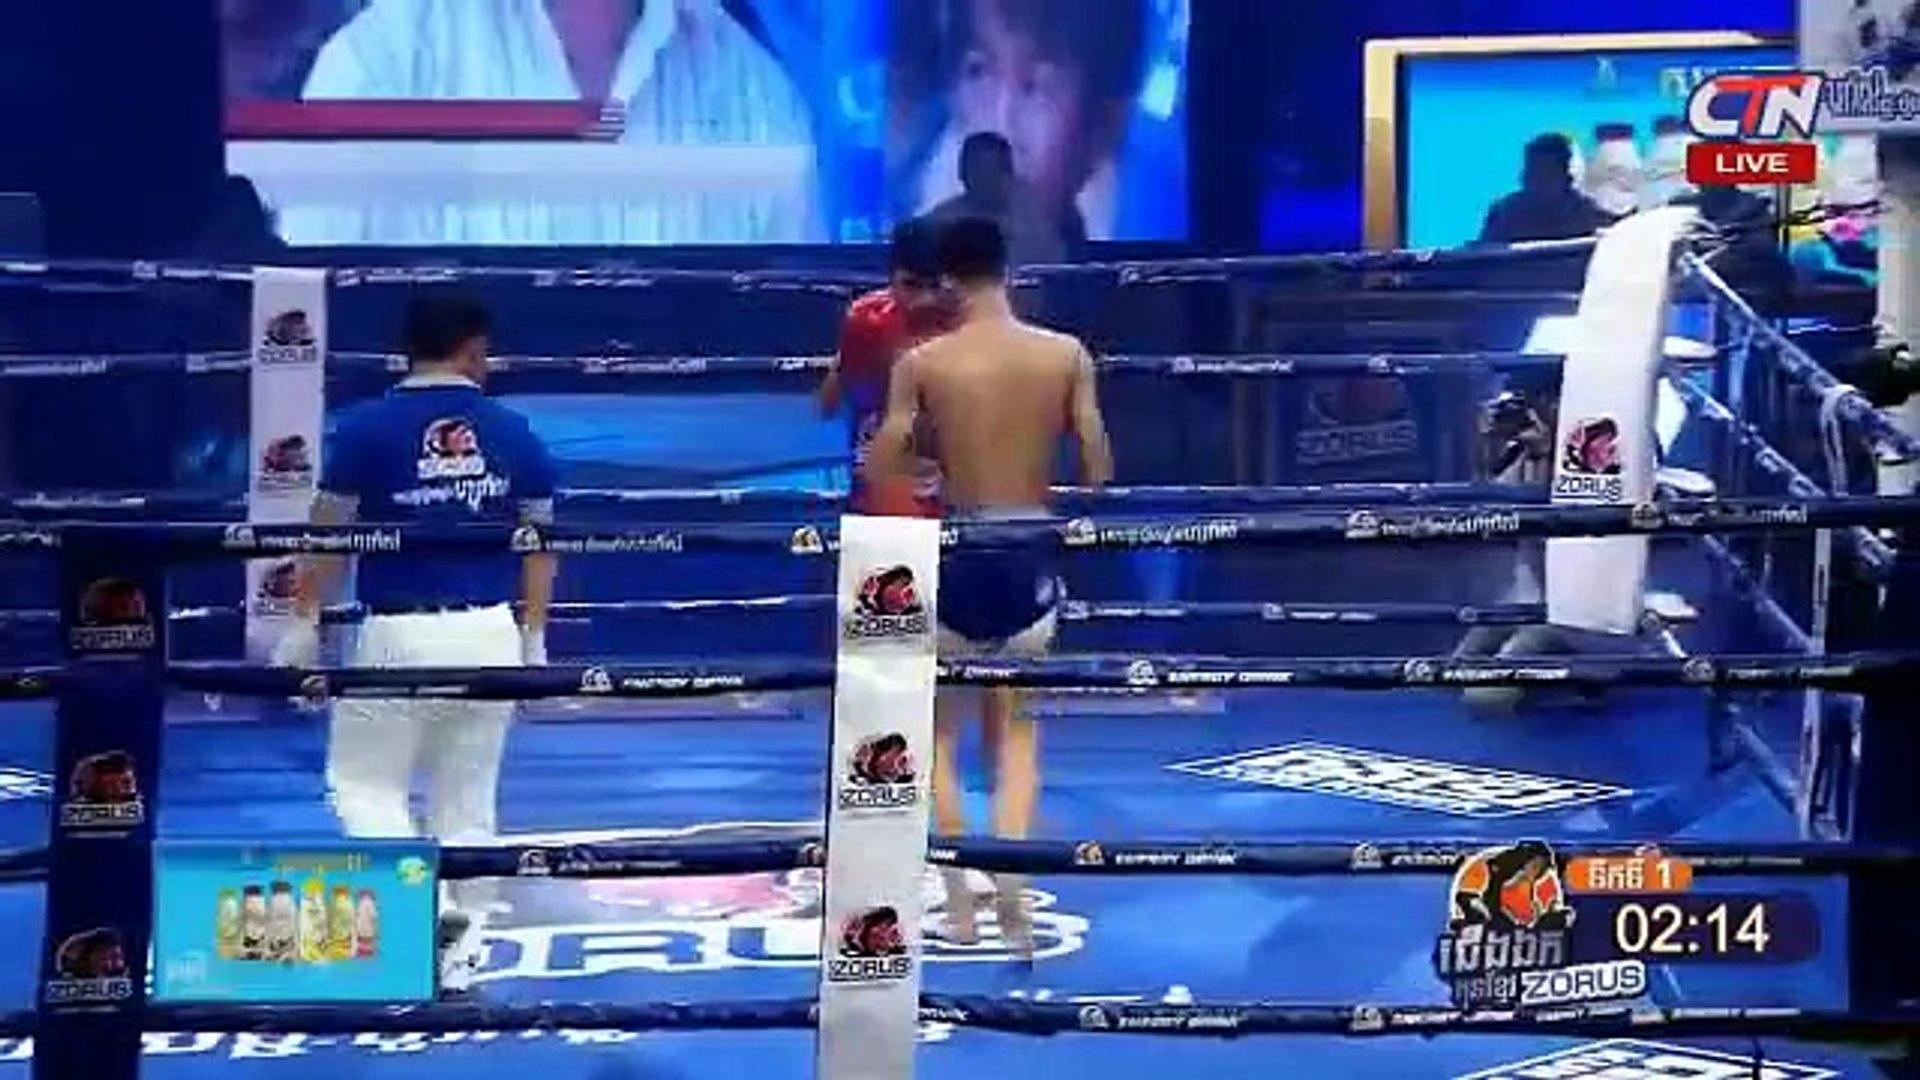 Long Chin, Cambodia Vs Ouysayam, Thai, 13 Jan 2019, International Boxing, Kun Khmer Boxing